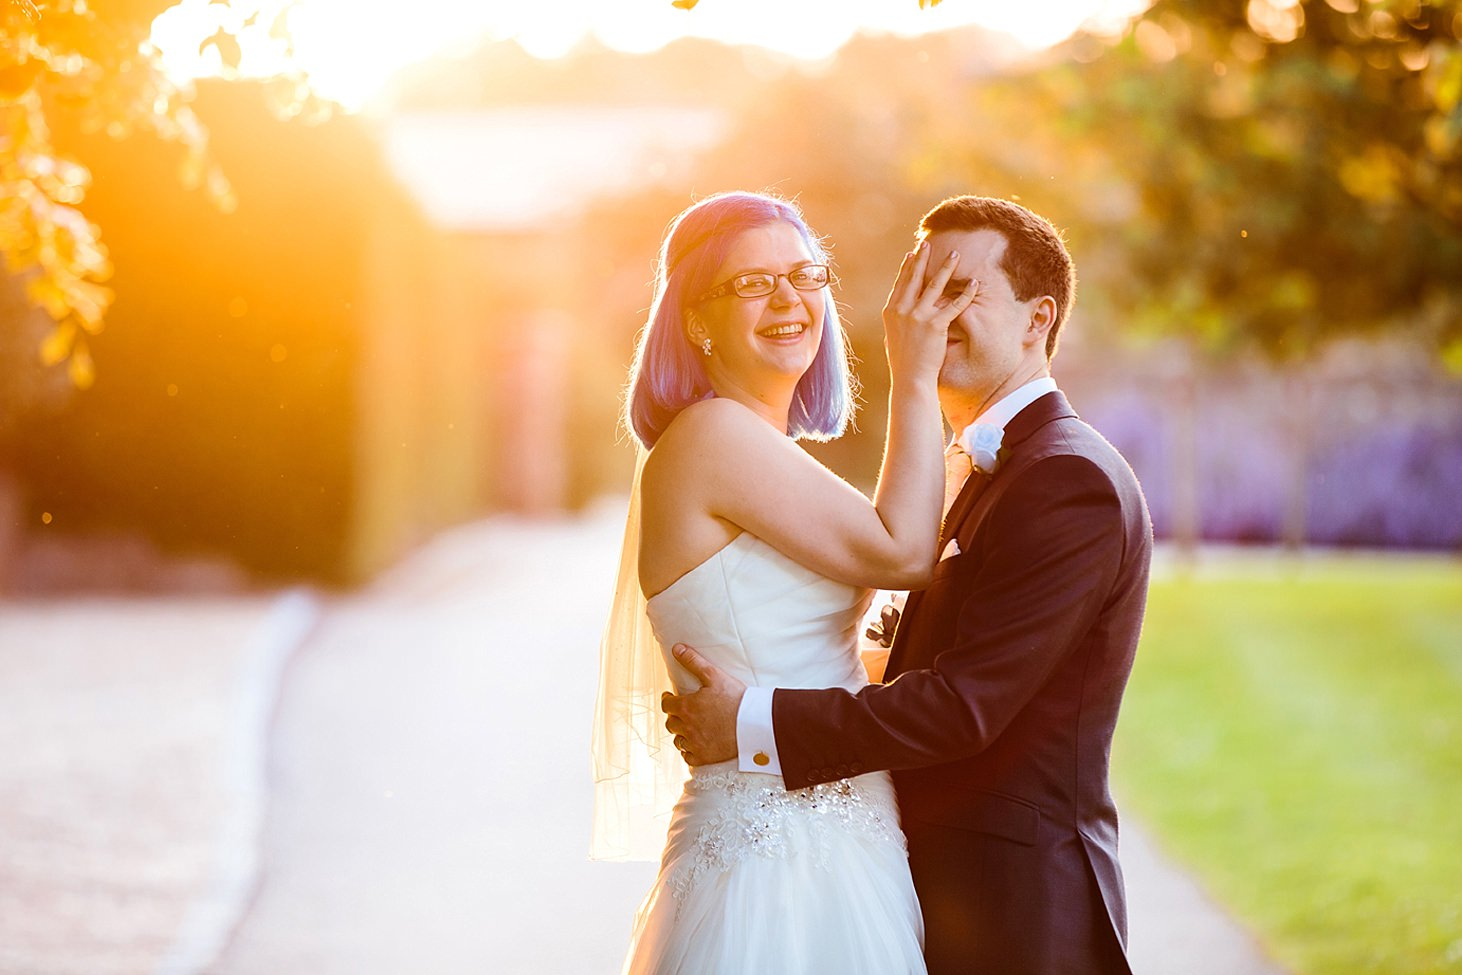 gate street barn wedding photography fun portrait of bride and groom